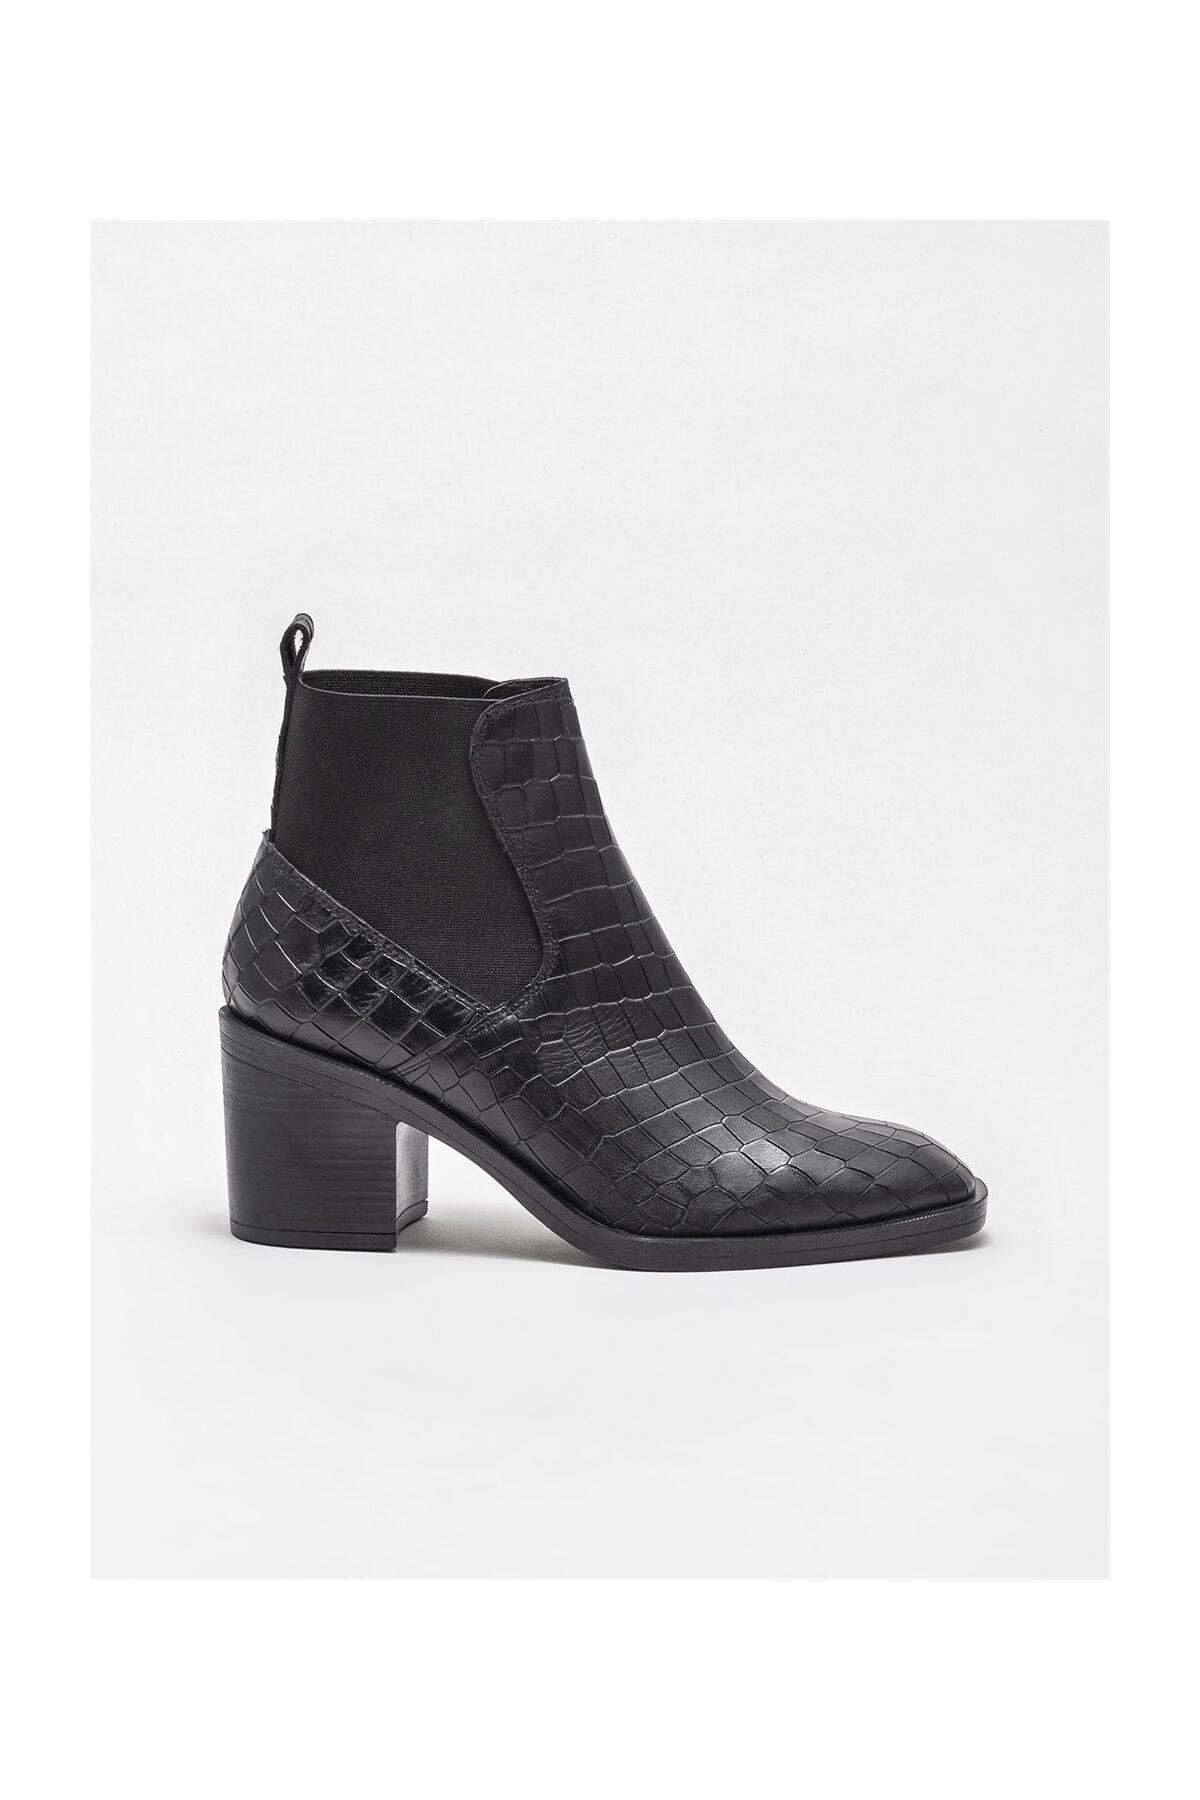 Elle Shoes Kadın Bot & Bootie 20KDS59204 2